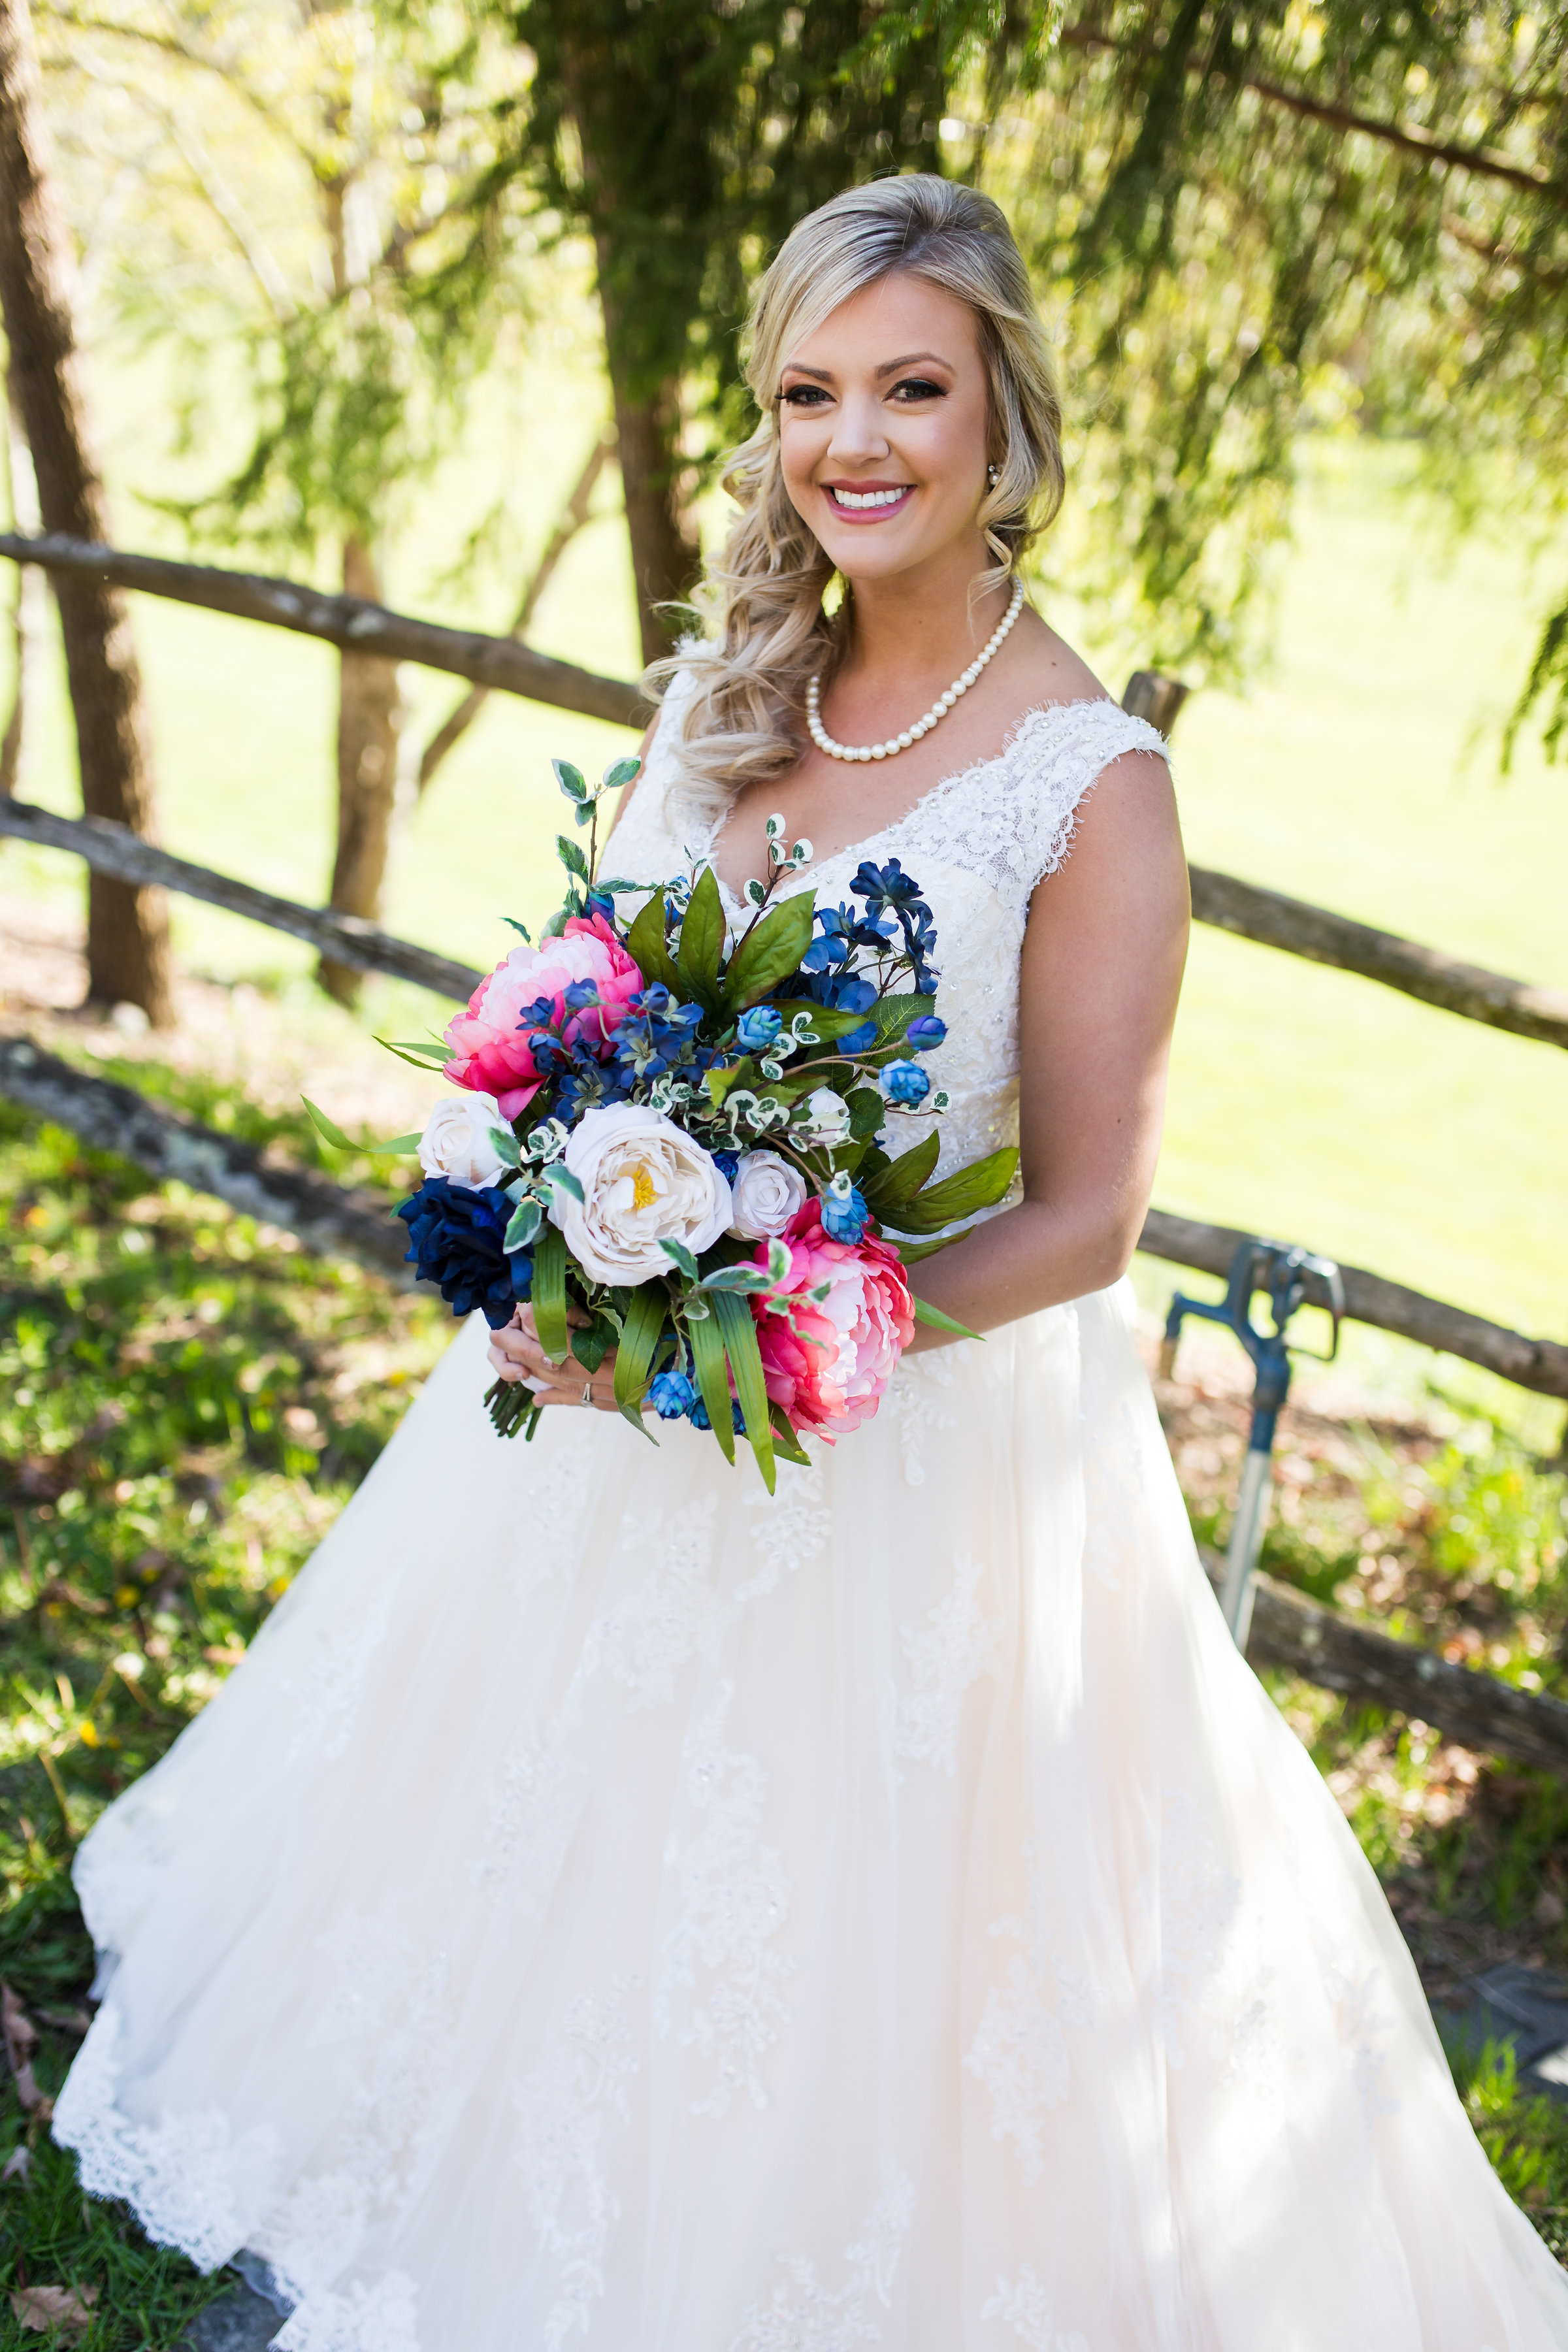 Honeysuckle-Hill-Asheville-Wedding-Venue-Ann-Cordell-Bridal-4.JPG